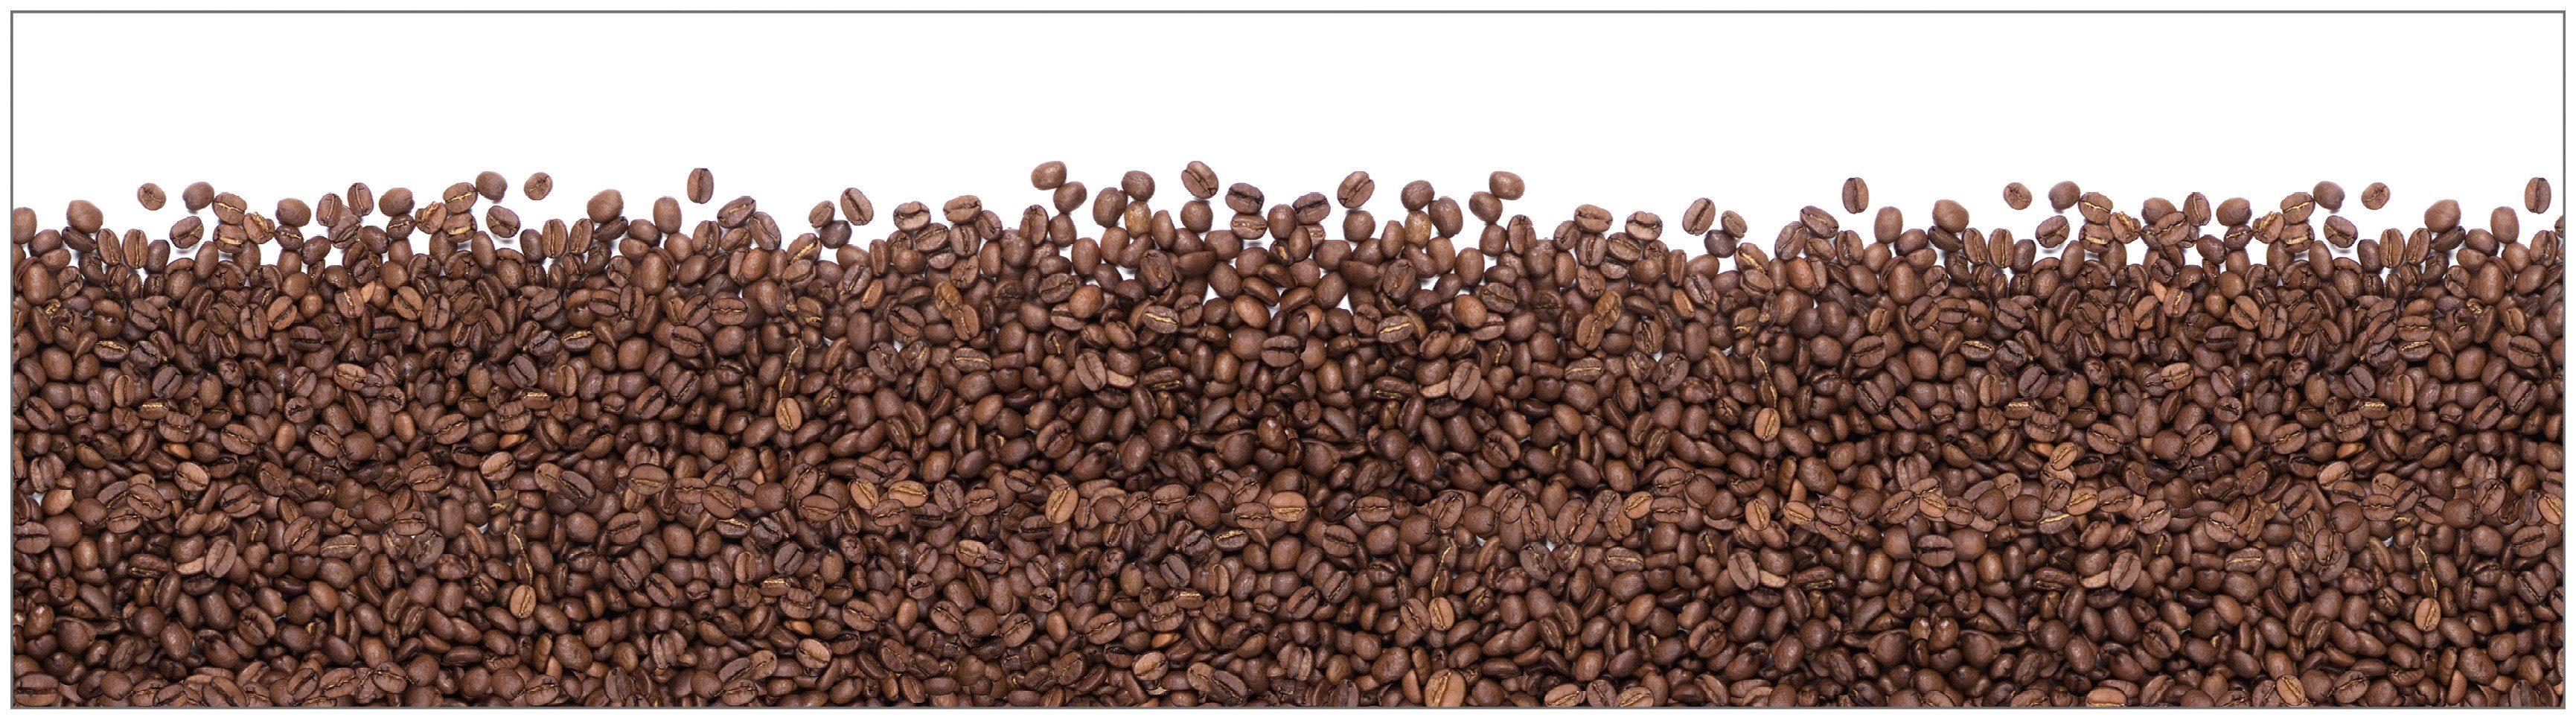 Küchenrückwand - Spritzschutz »profix«, Espresso, 220x60 cm